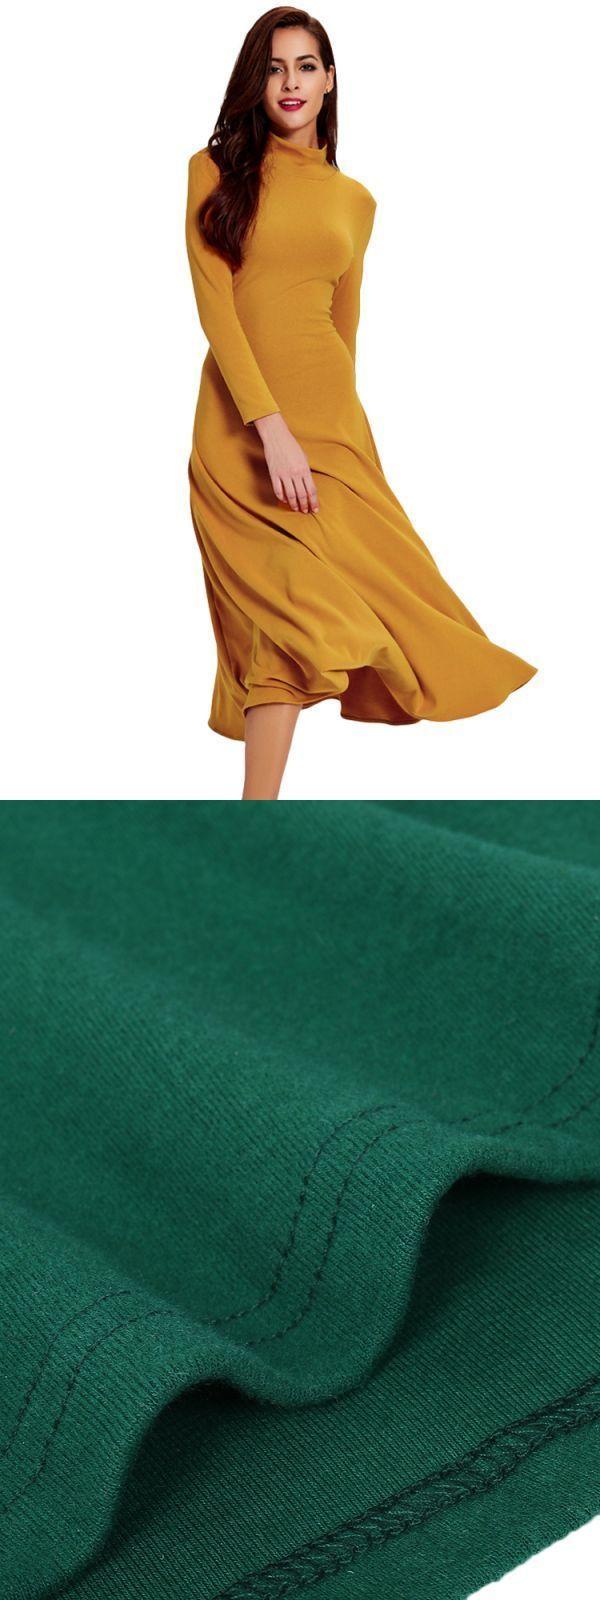 Maxi dresses 3x elegant women solid turtleneck long sleeve hollow out backless maxi dress #maxi #dress #age #8 #maxi #dresses #for #tall #women #maxi #dresses #jabong #s #maxi #dress